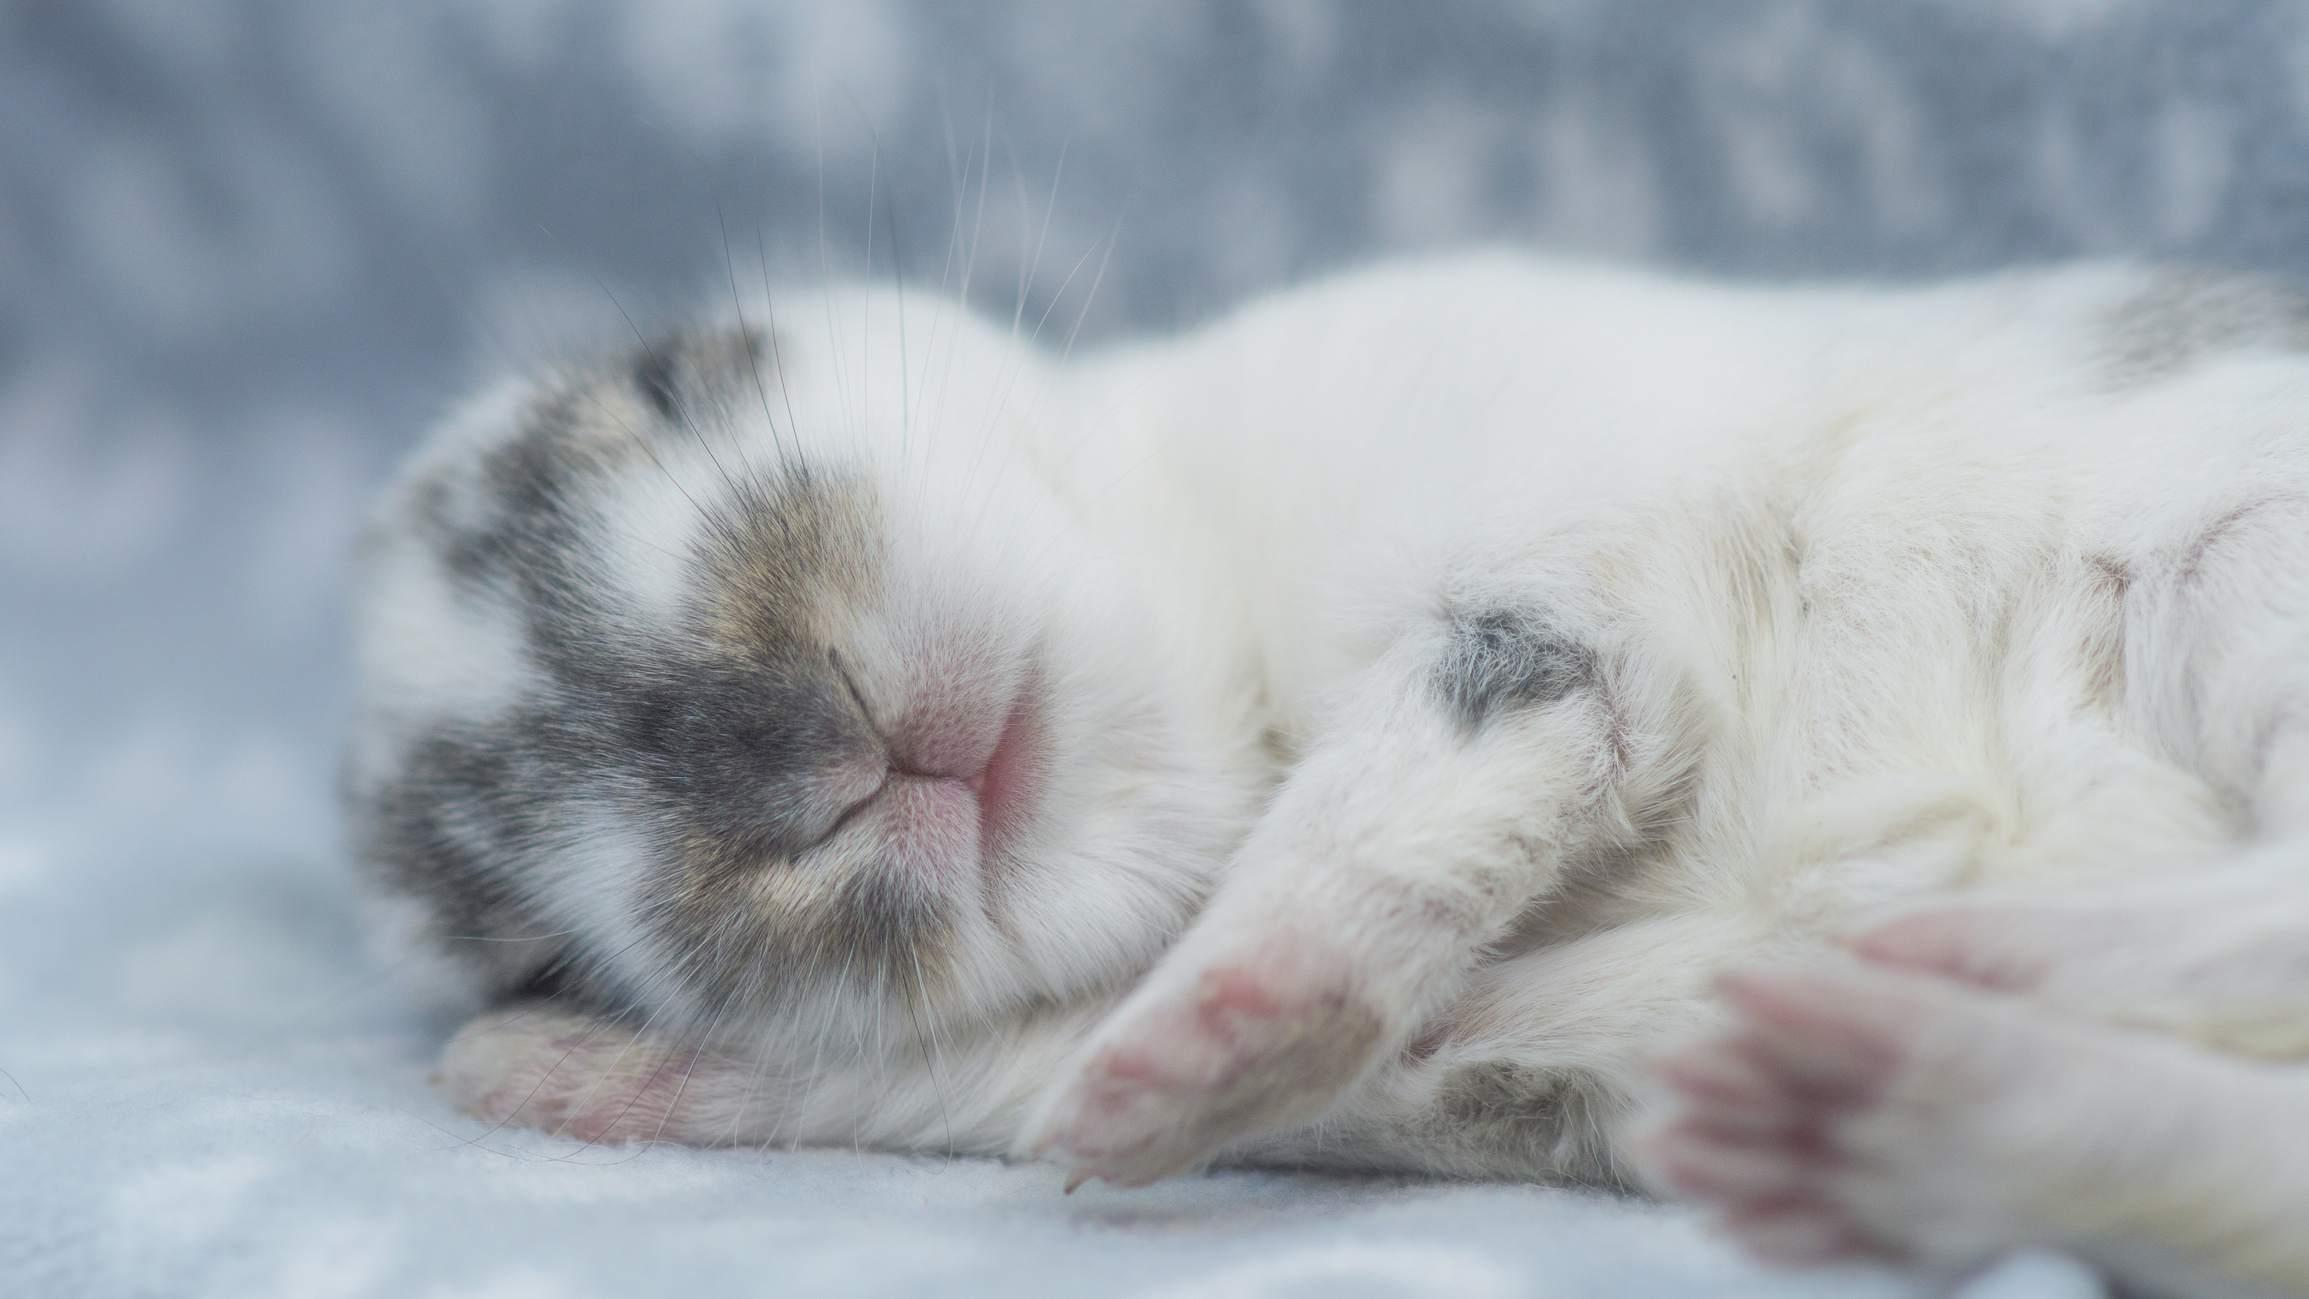 Little rabbit sleeping in his bed